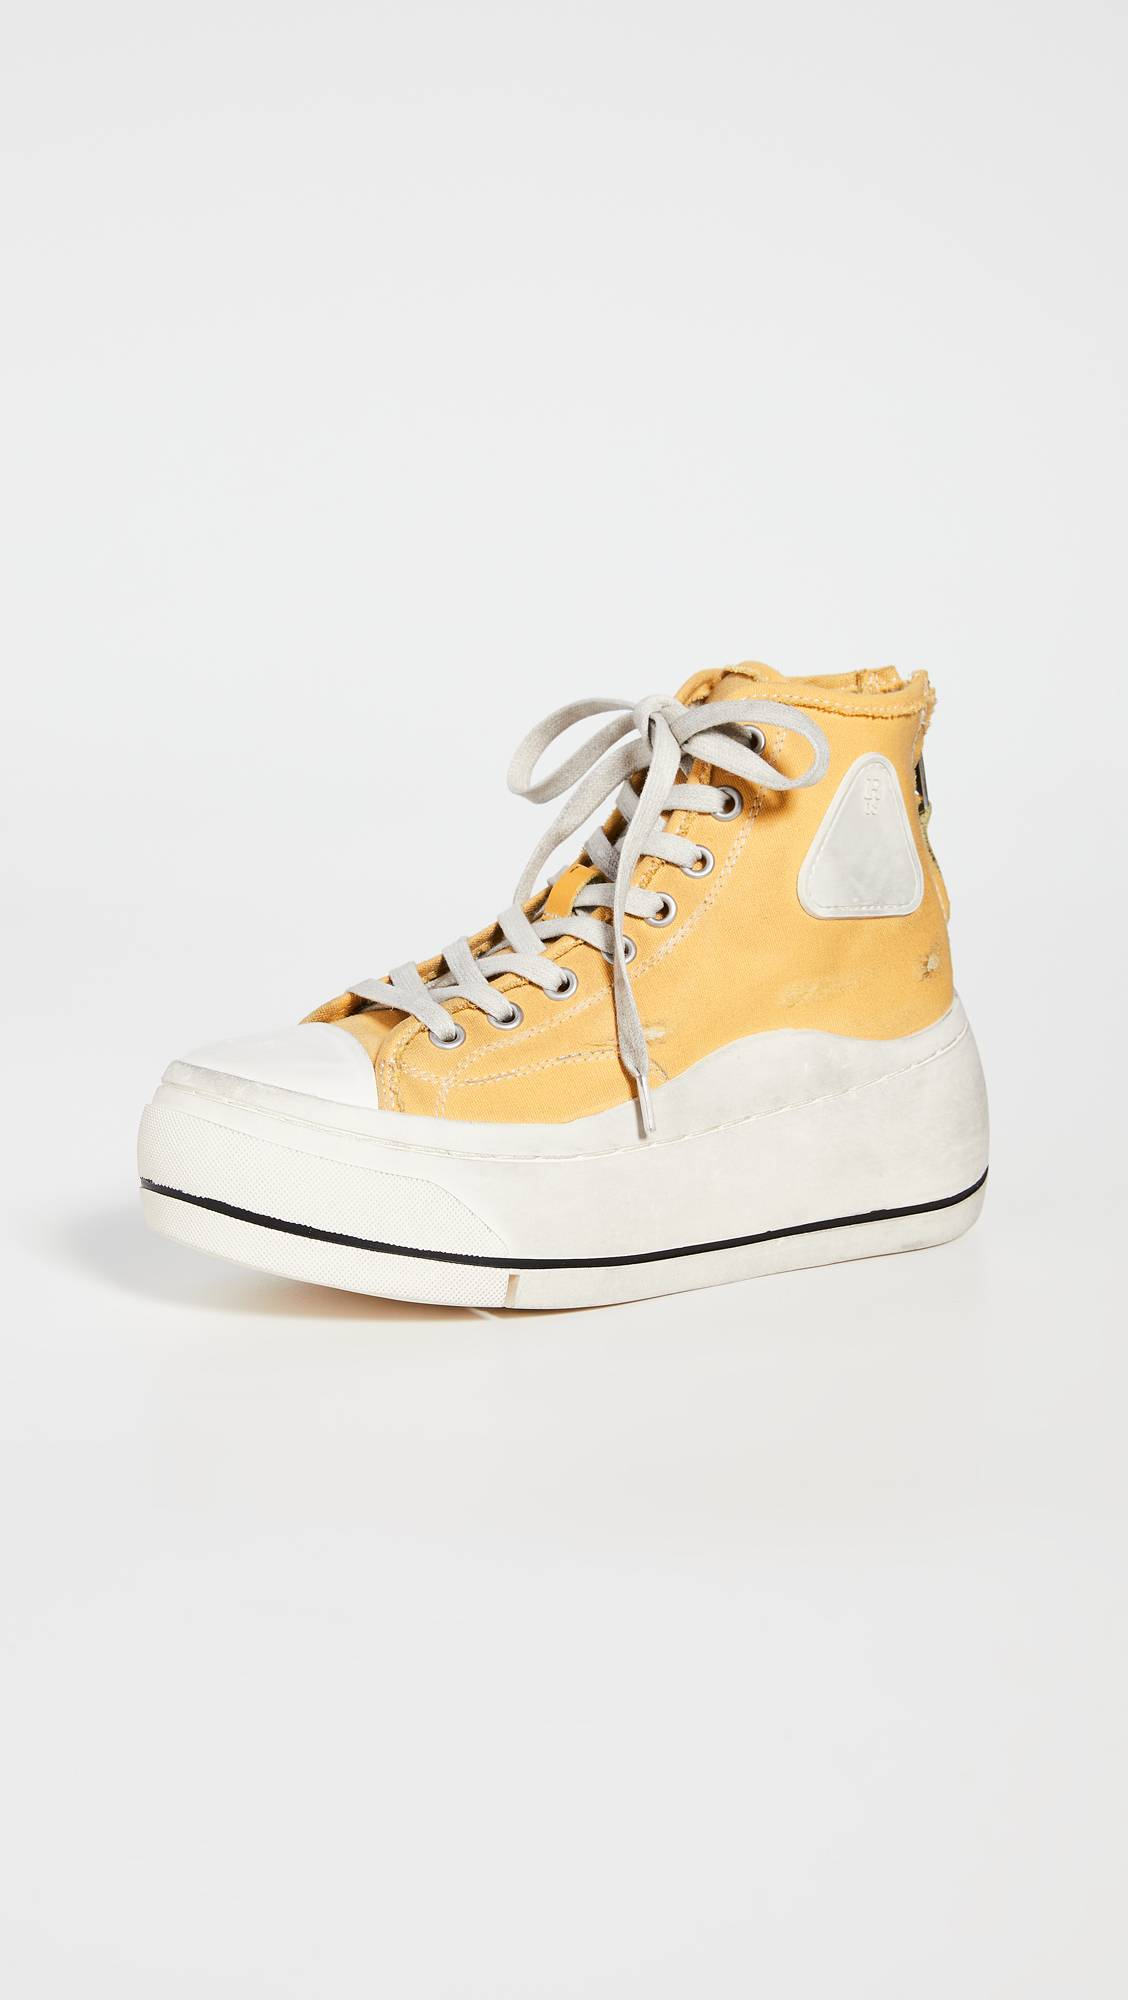 7. kép: R13 sneaker